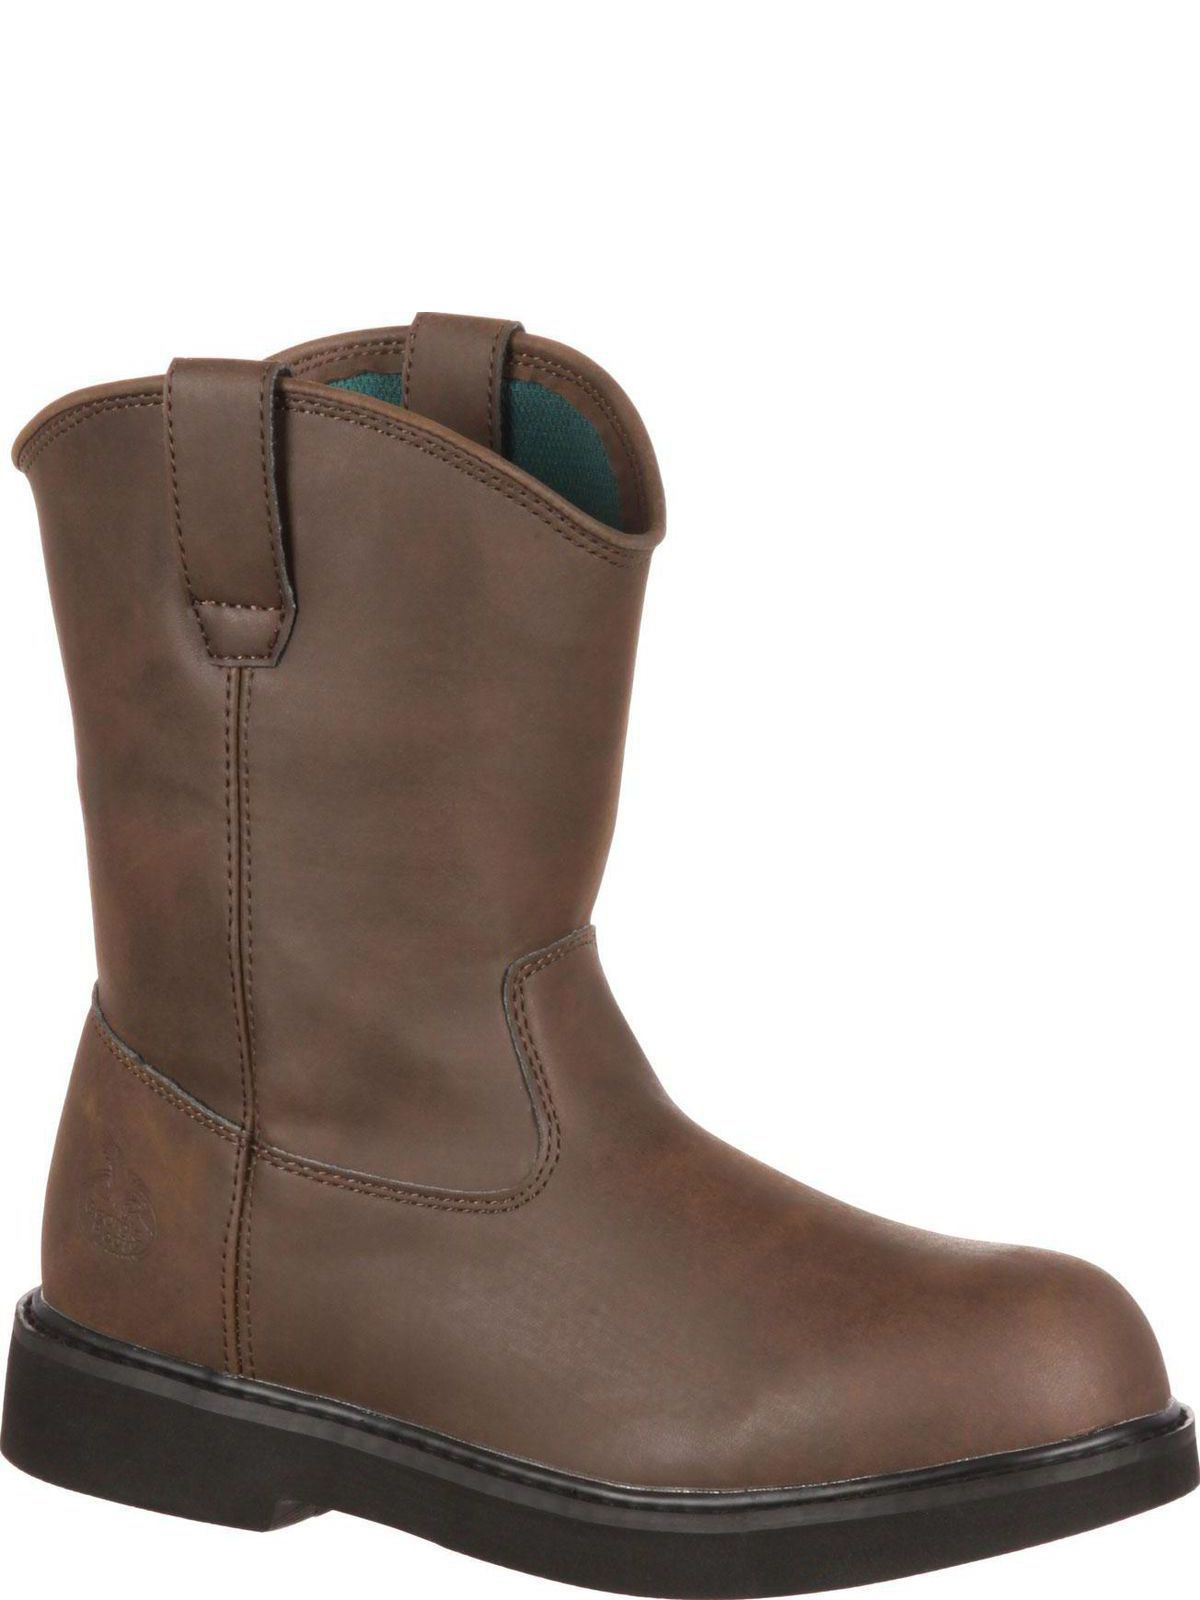 bootamerica boot kid pull on boot g099